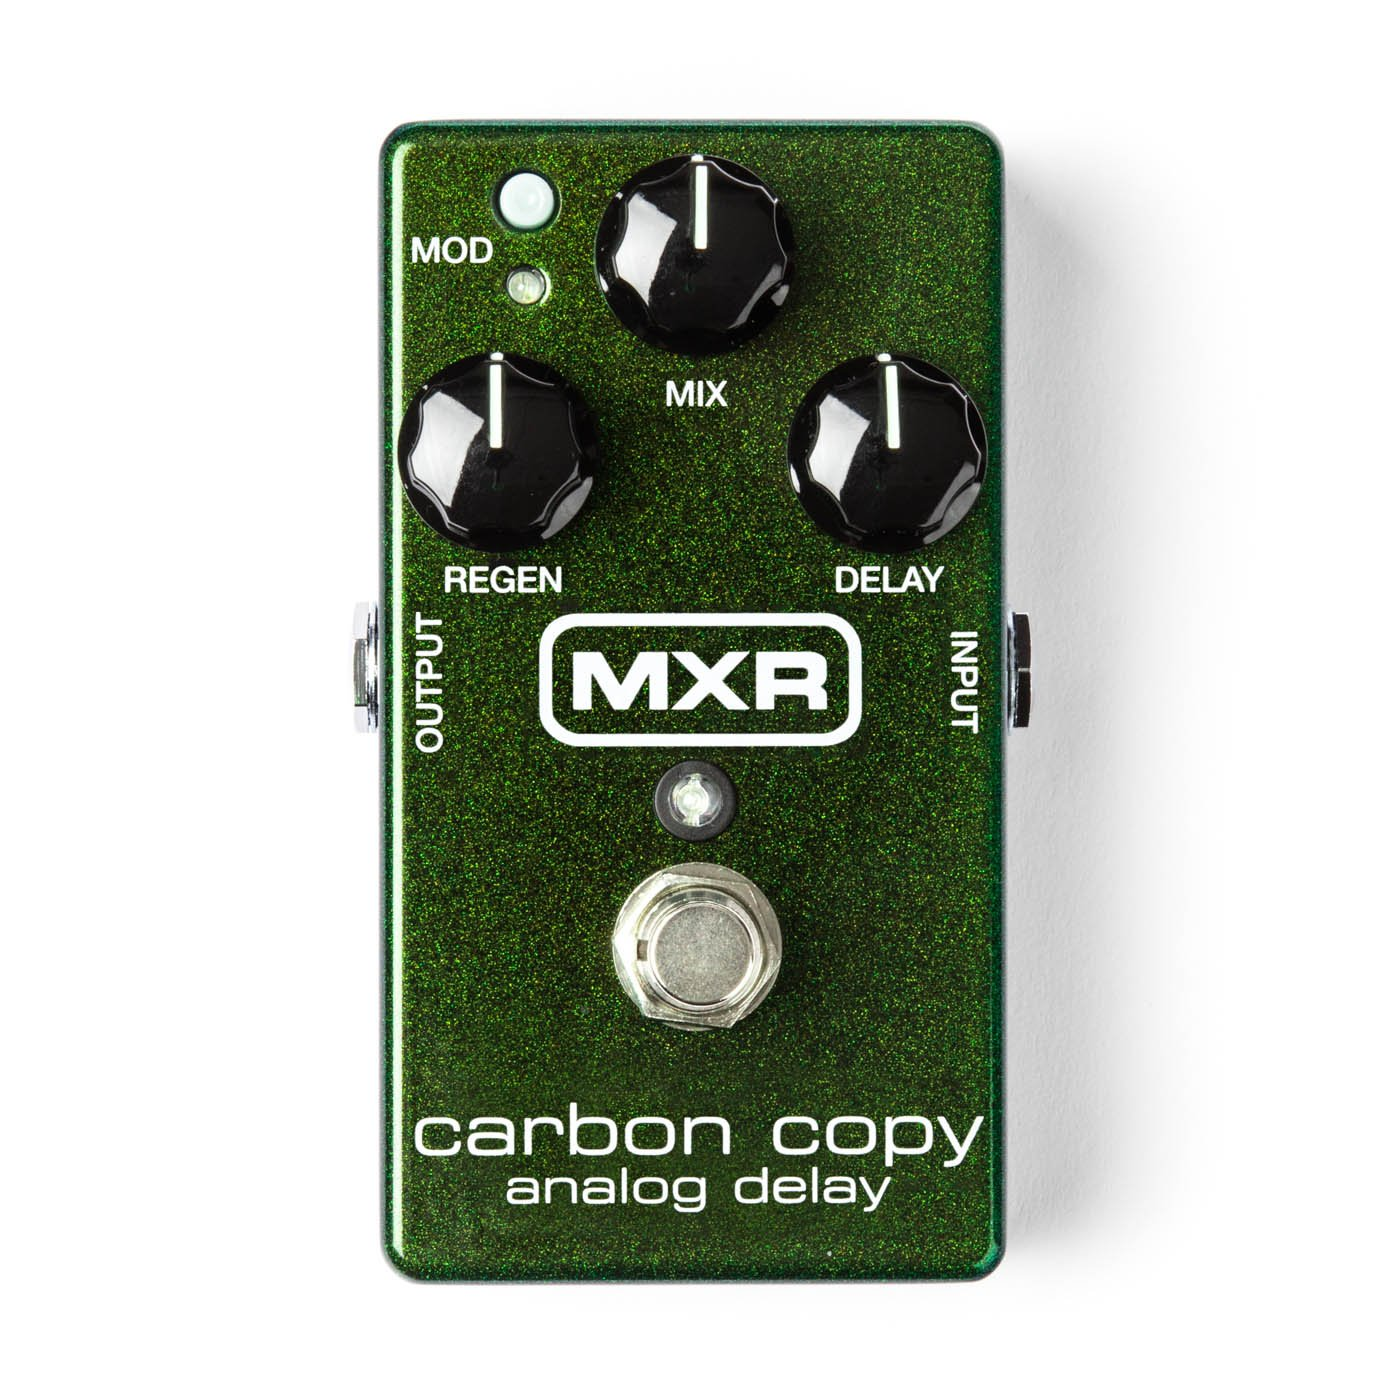 MXR Carbon Copy Analog Dealy